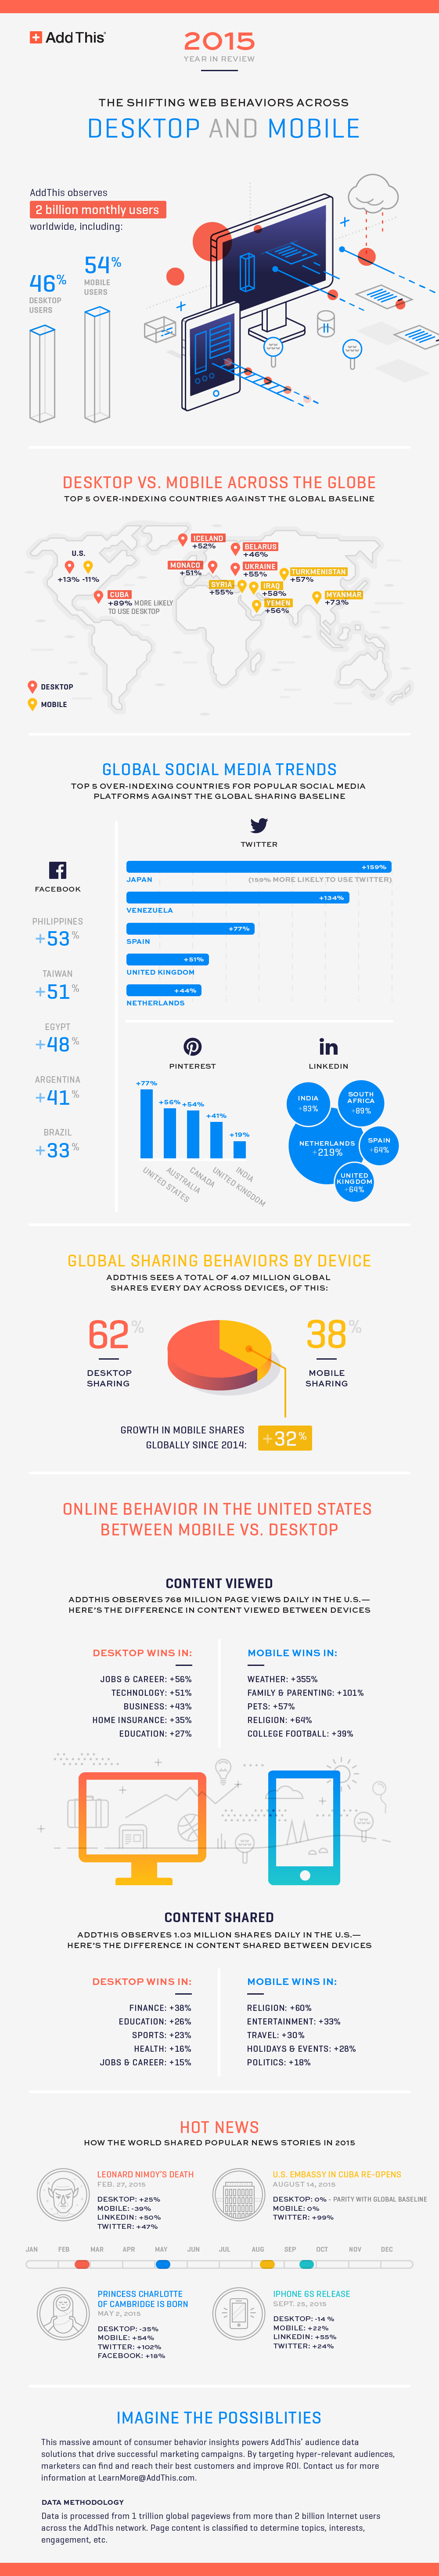 shifting-internet-behavior-infographic.png